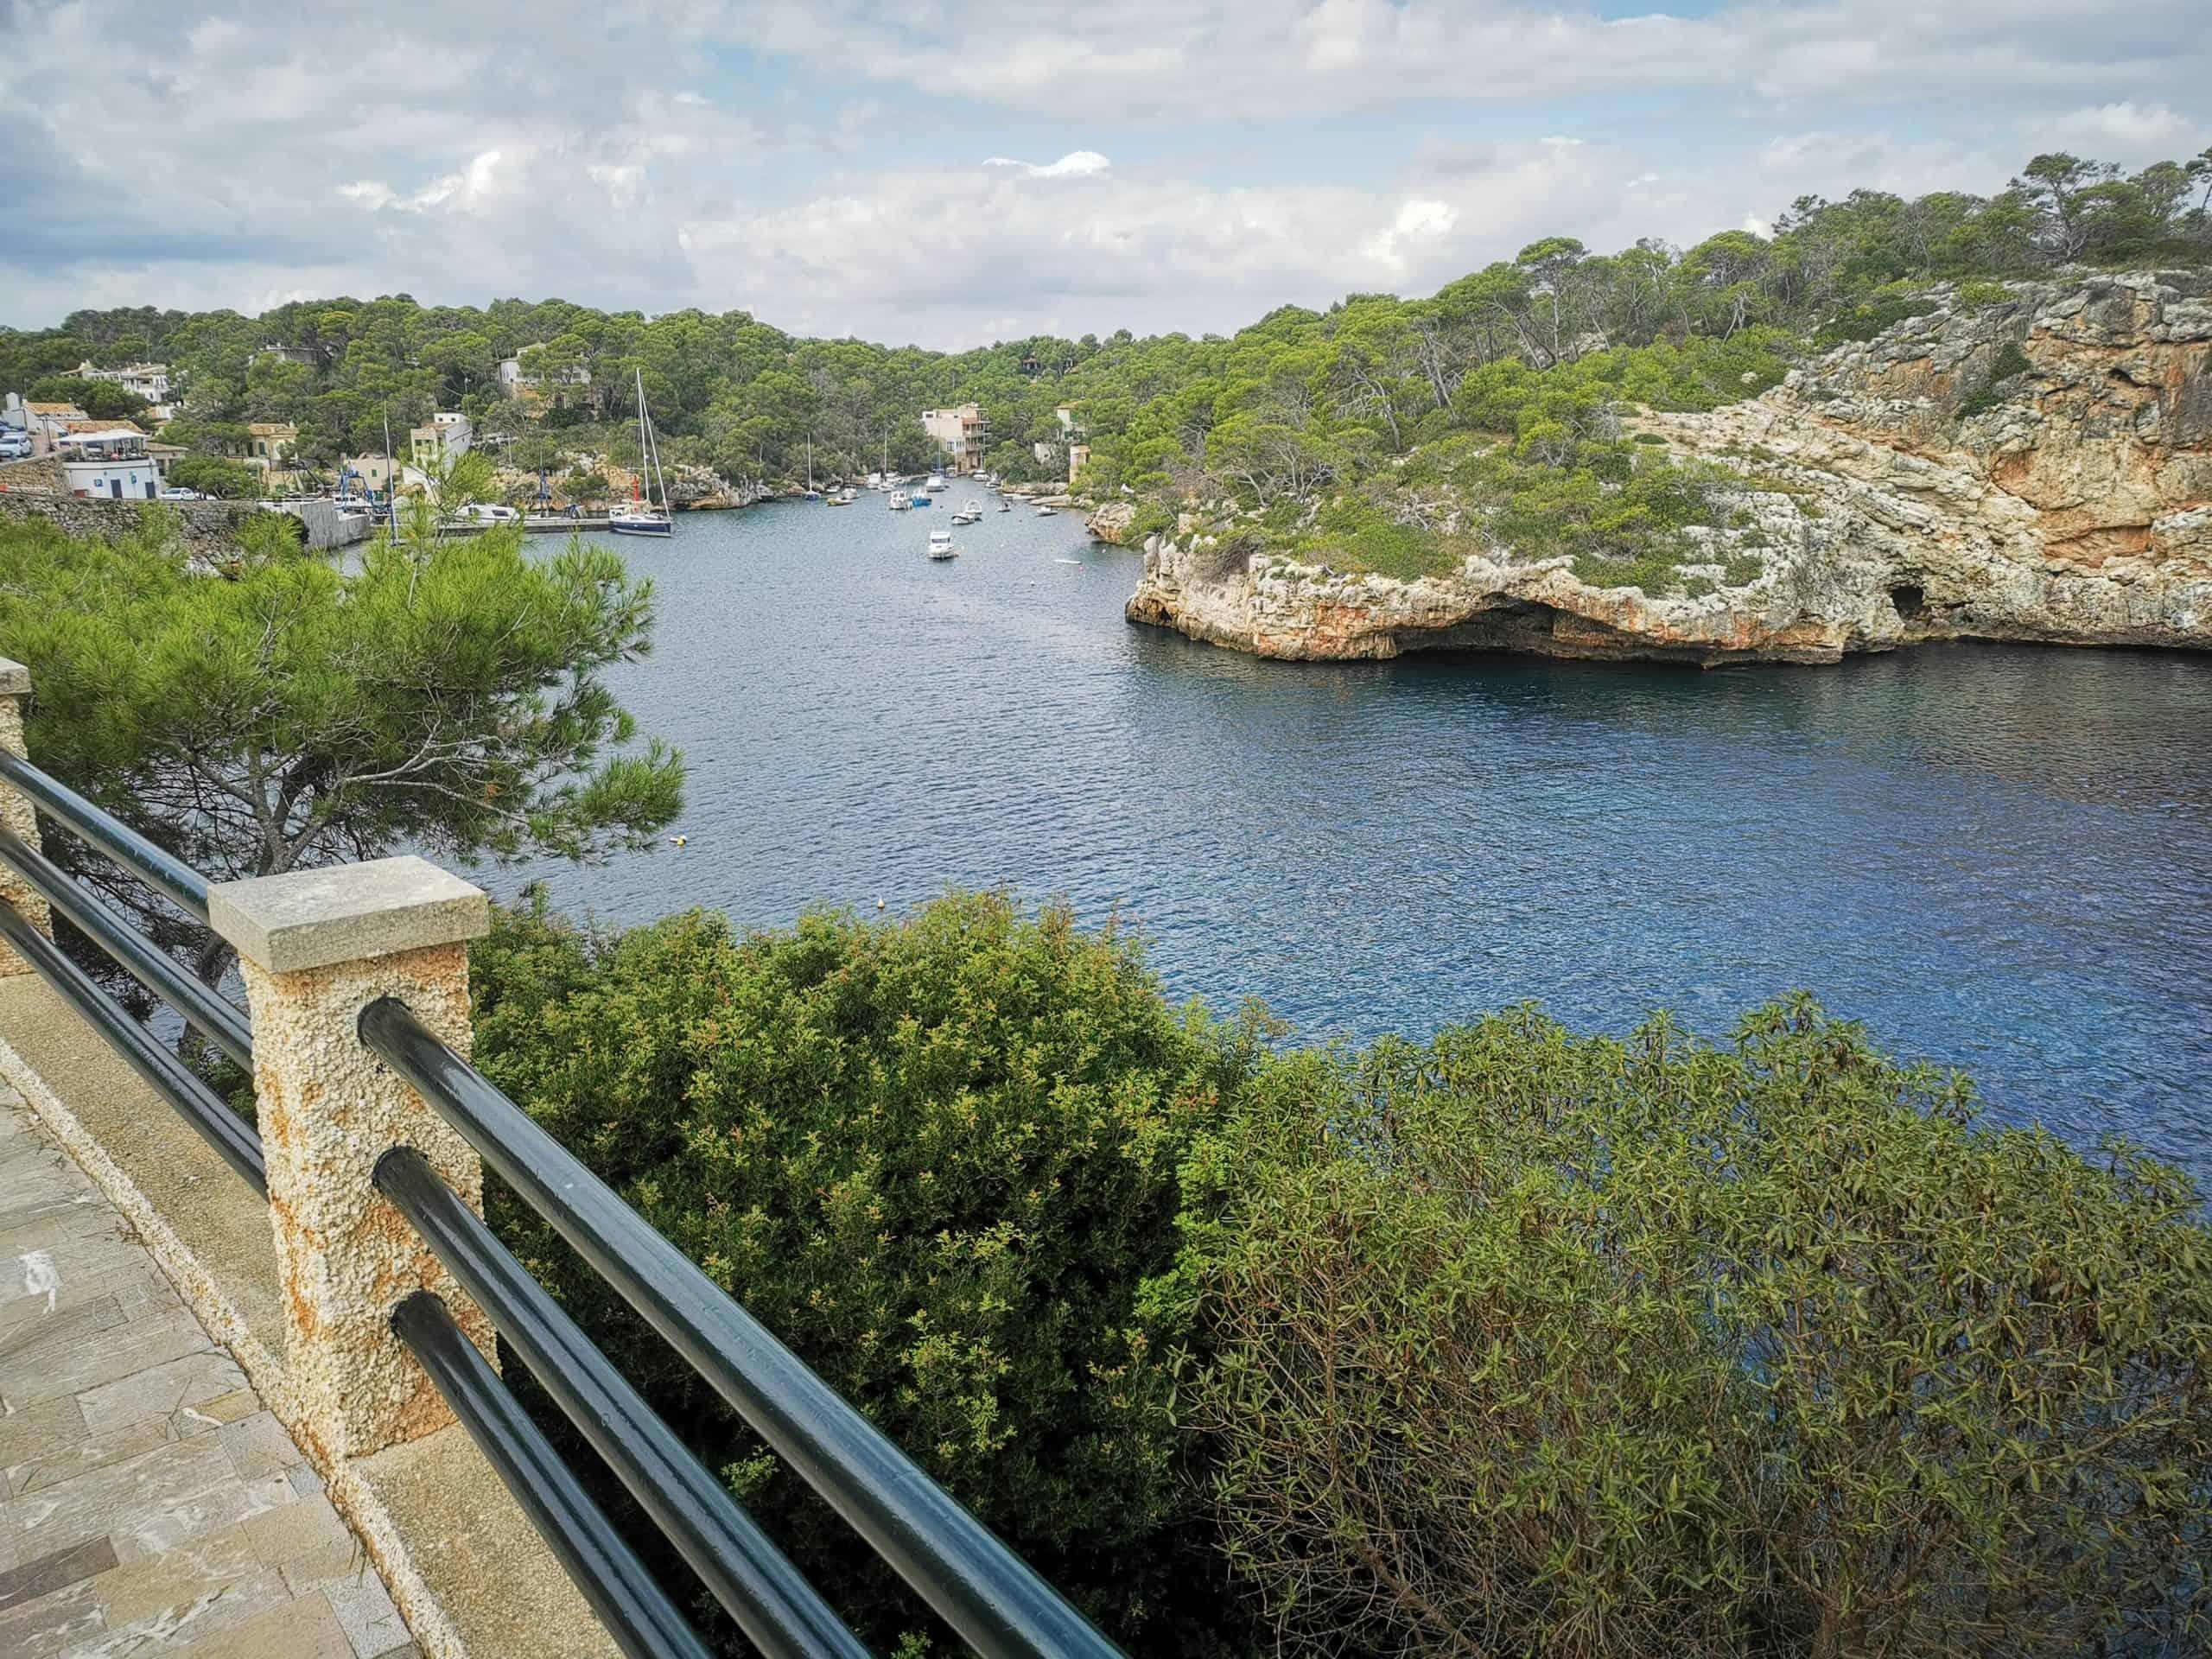 Cala Figuera Mallorca Aussicht auf Strand